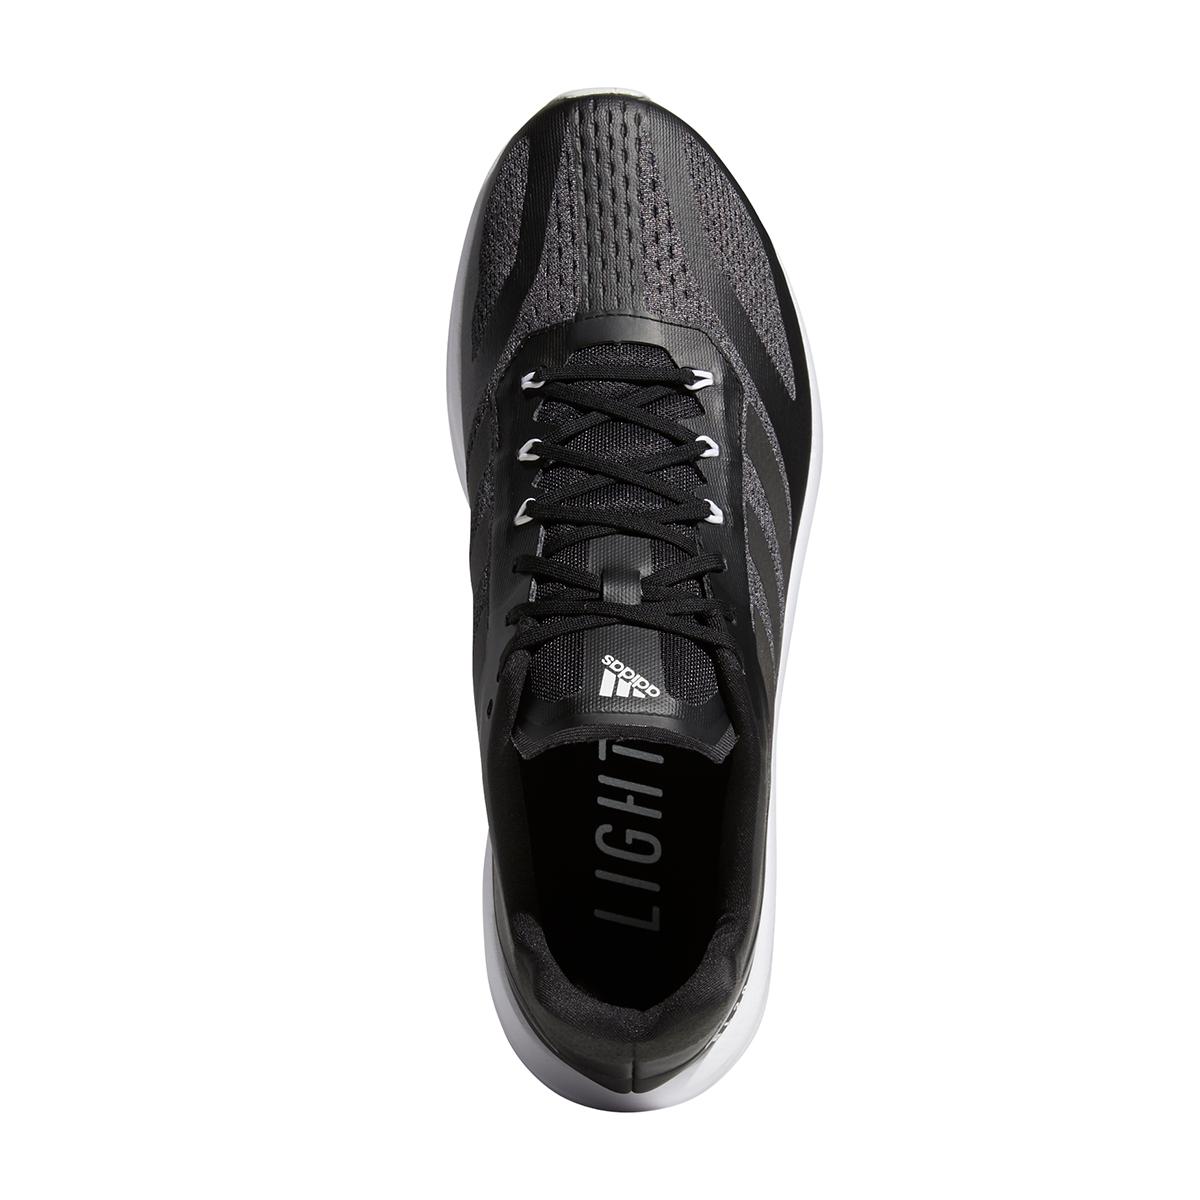 Men's Adidas SL20.2 Running Shoe - Color: Core Black/Grey - Size: 6.5 - Width: Regular, Core Black/Grey, large, image 5